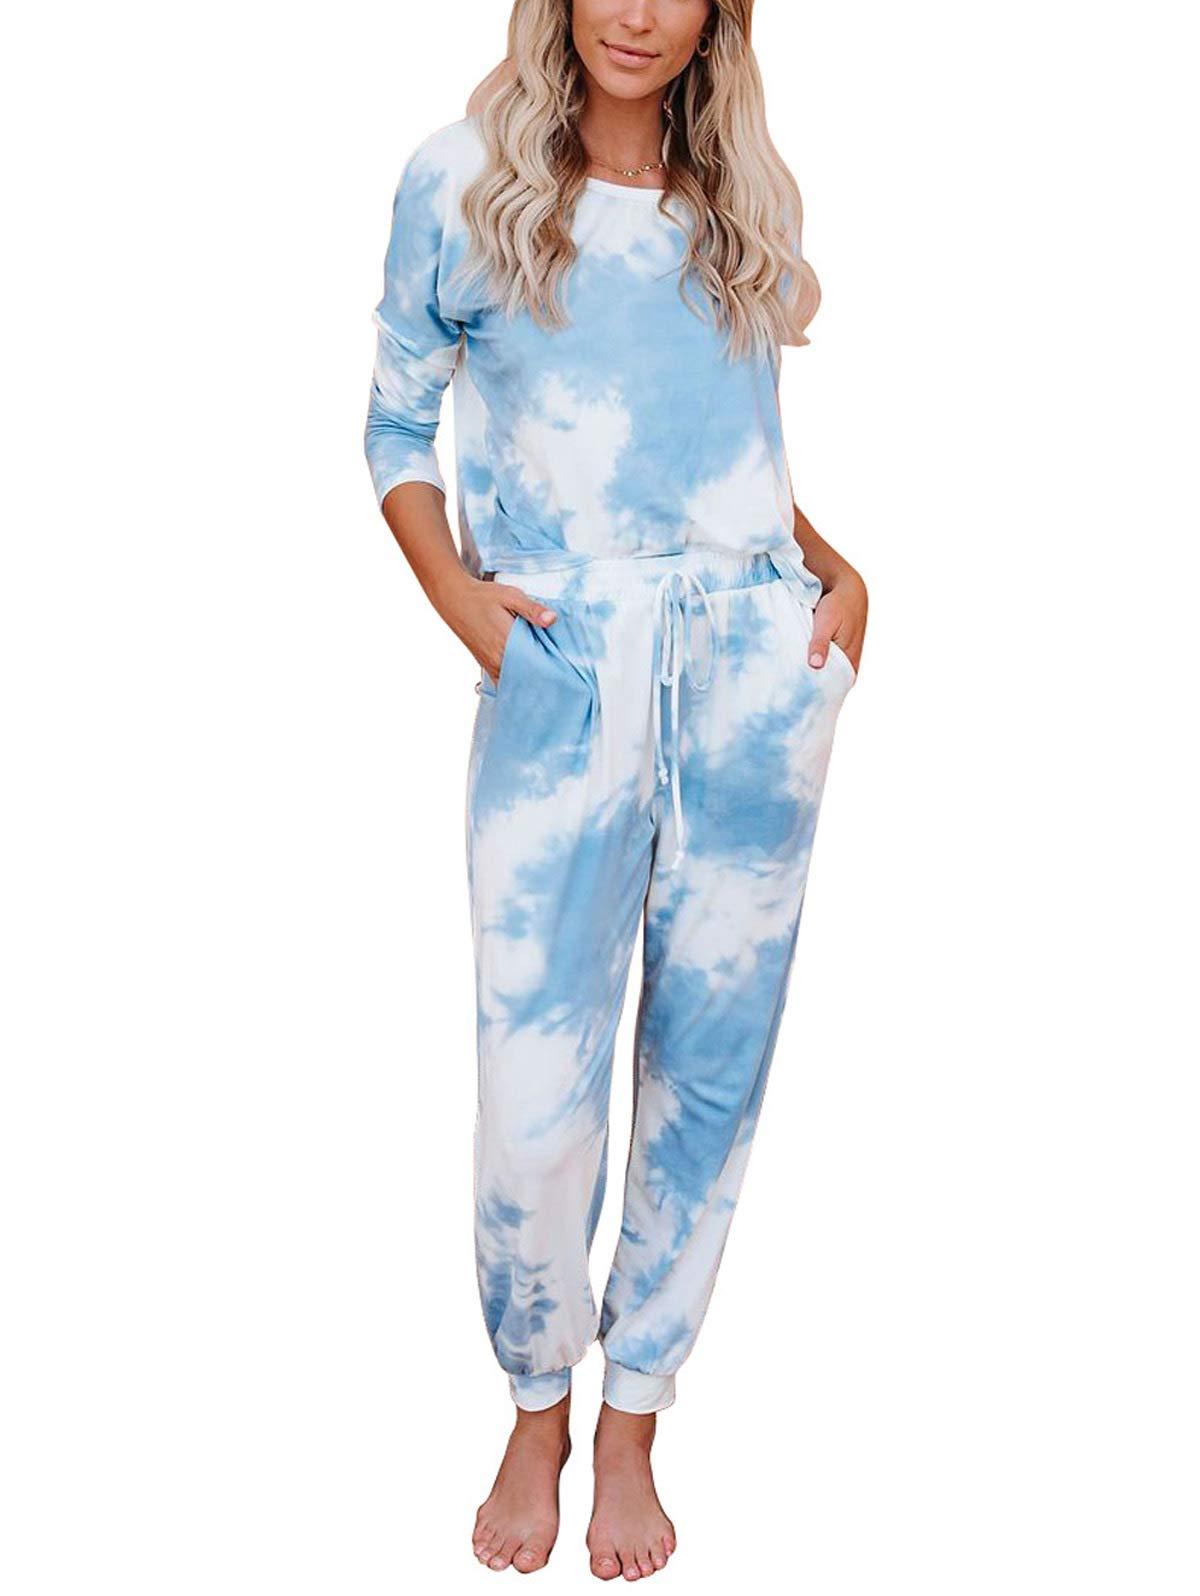 LANREMON Womens Pajamas Set Tie Dye Print Short/Long Sleeve Tops with Pants Pockets PJ Set Sleepwear Loungewear